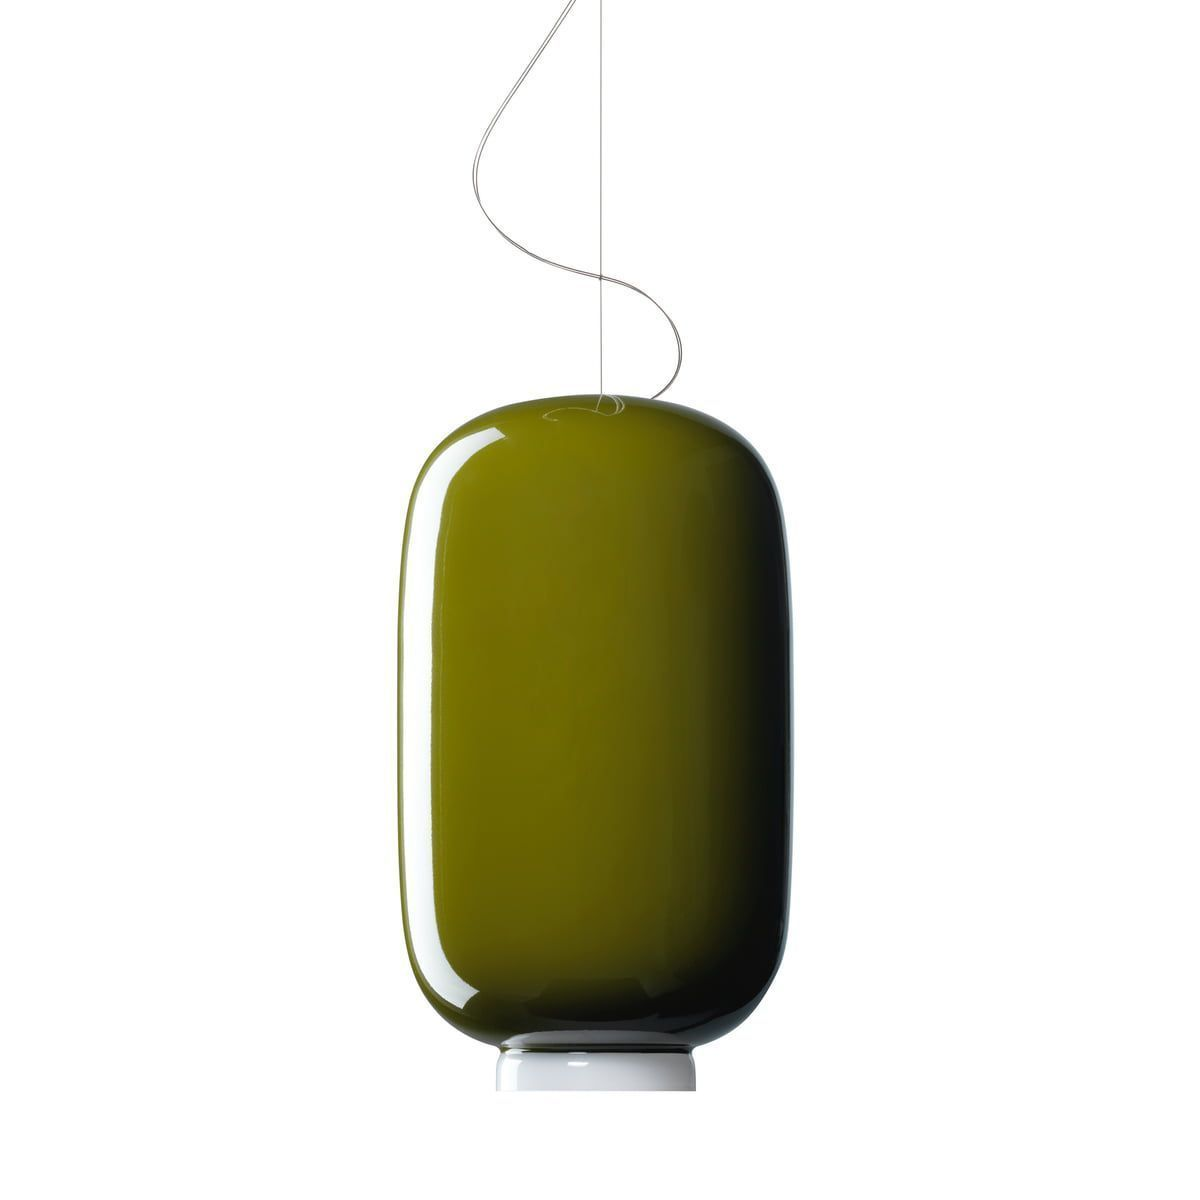 Lustra Luminaire Verde